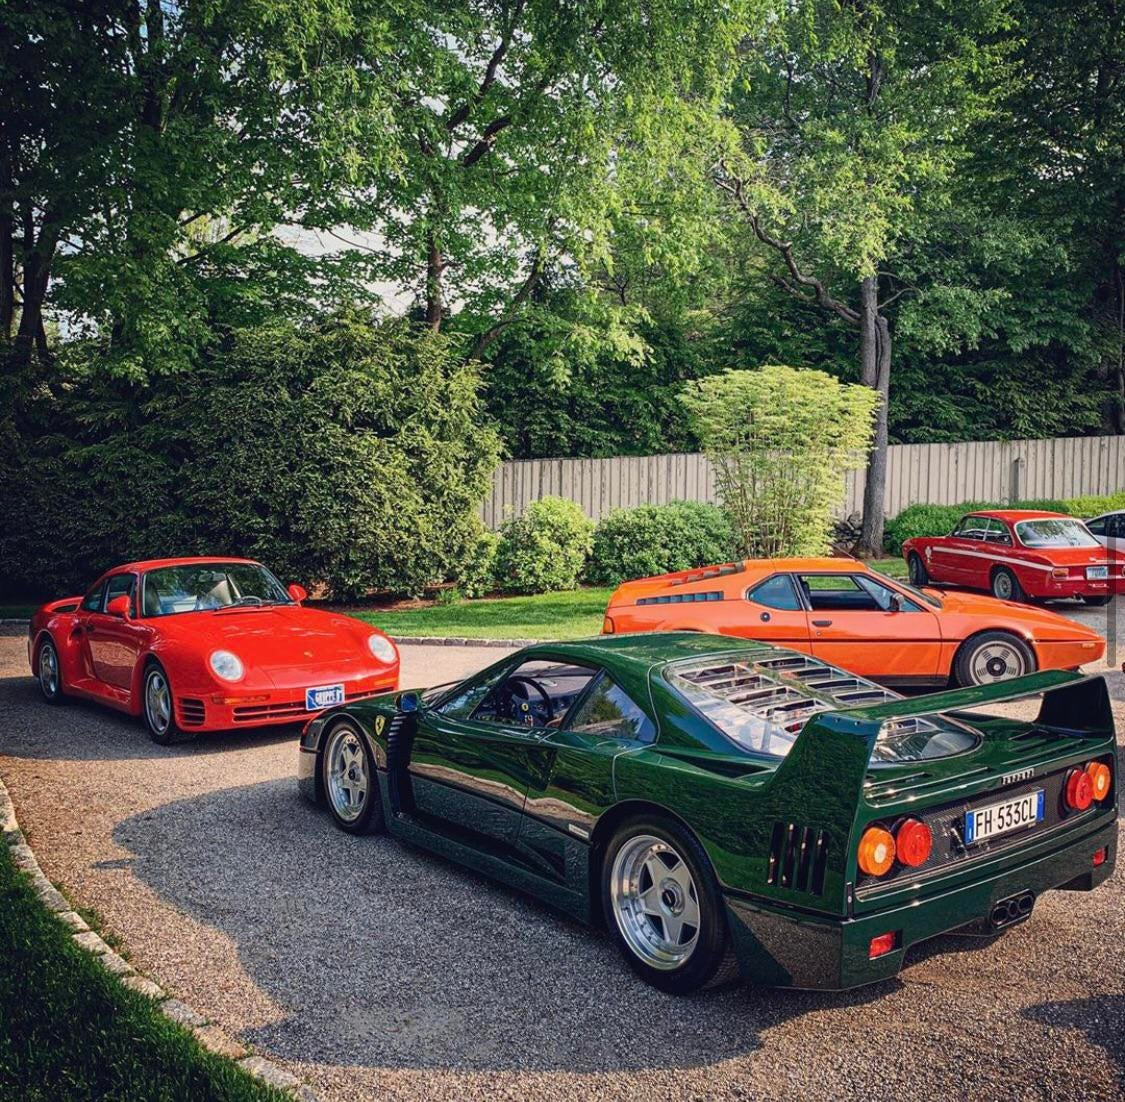 This must be heaven…. F40,959,M1,Alfa Romeo